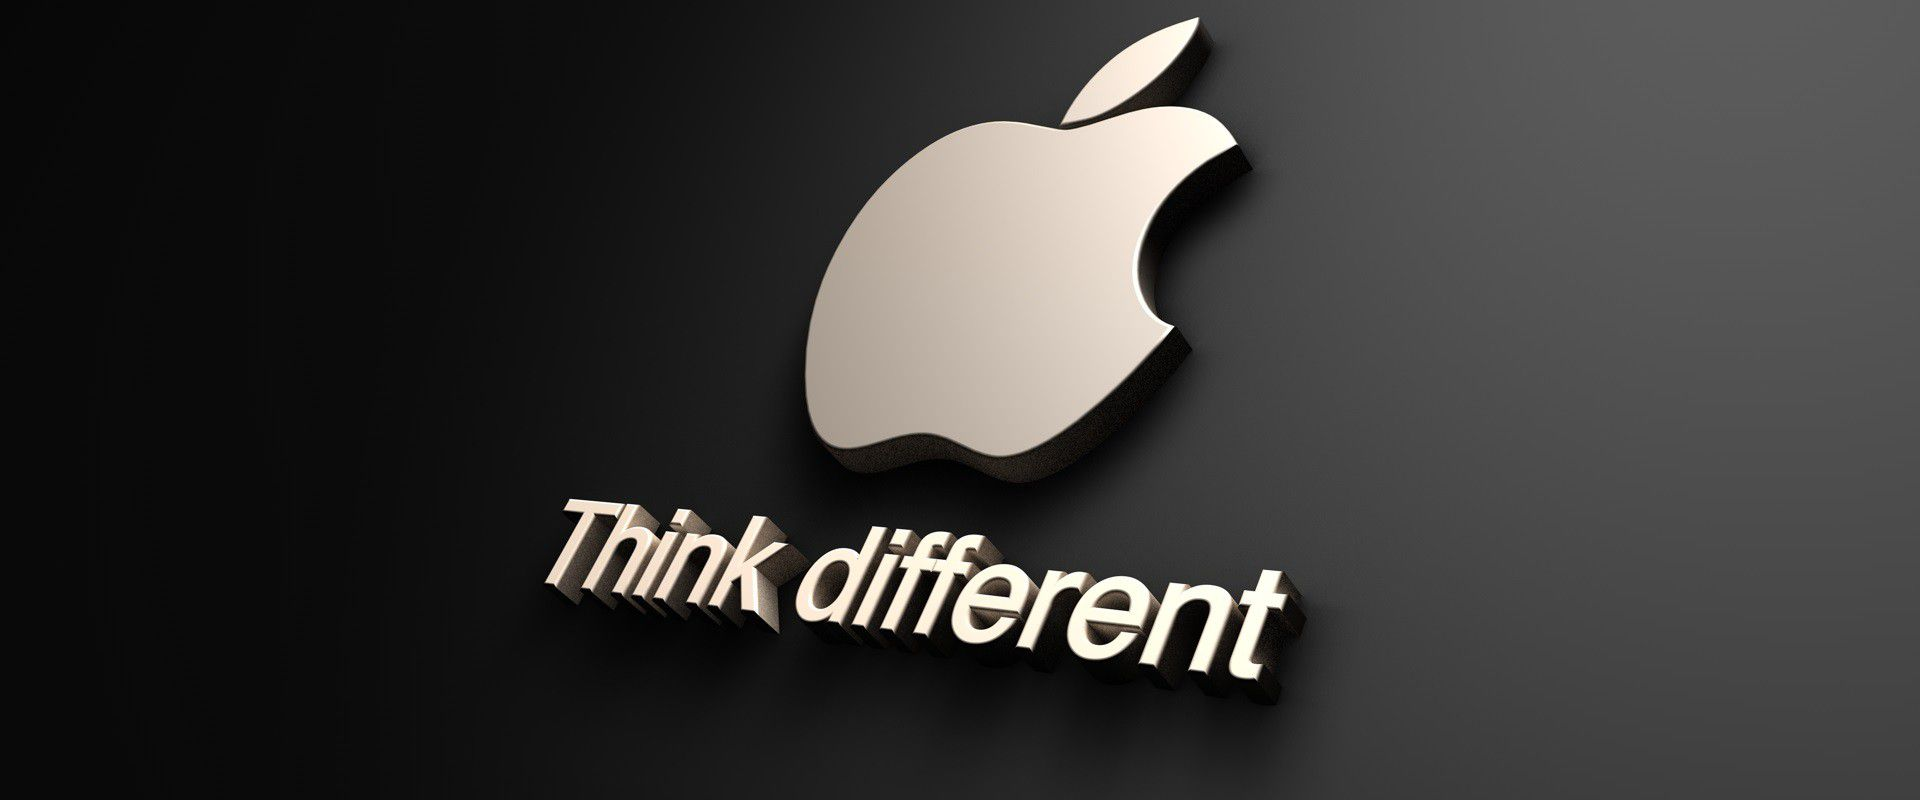 Apple side